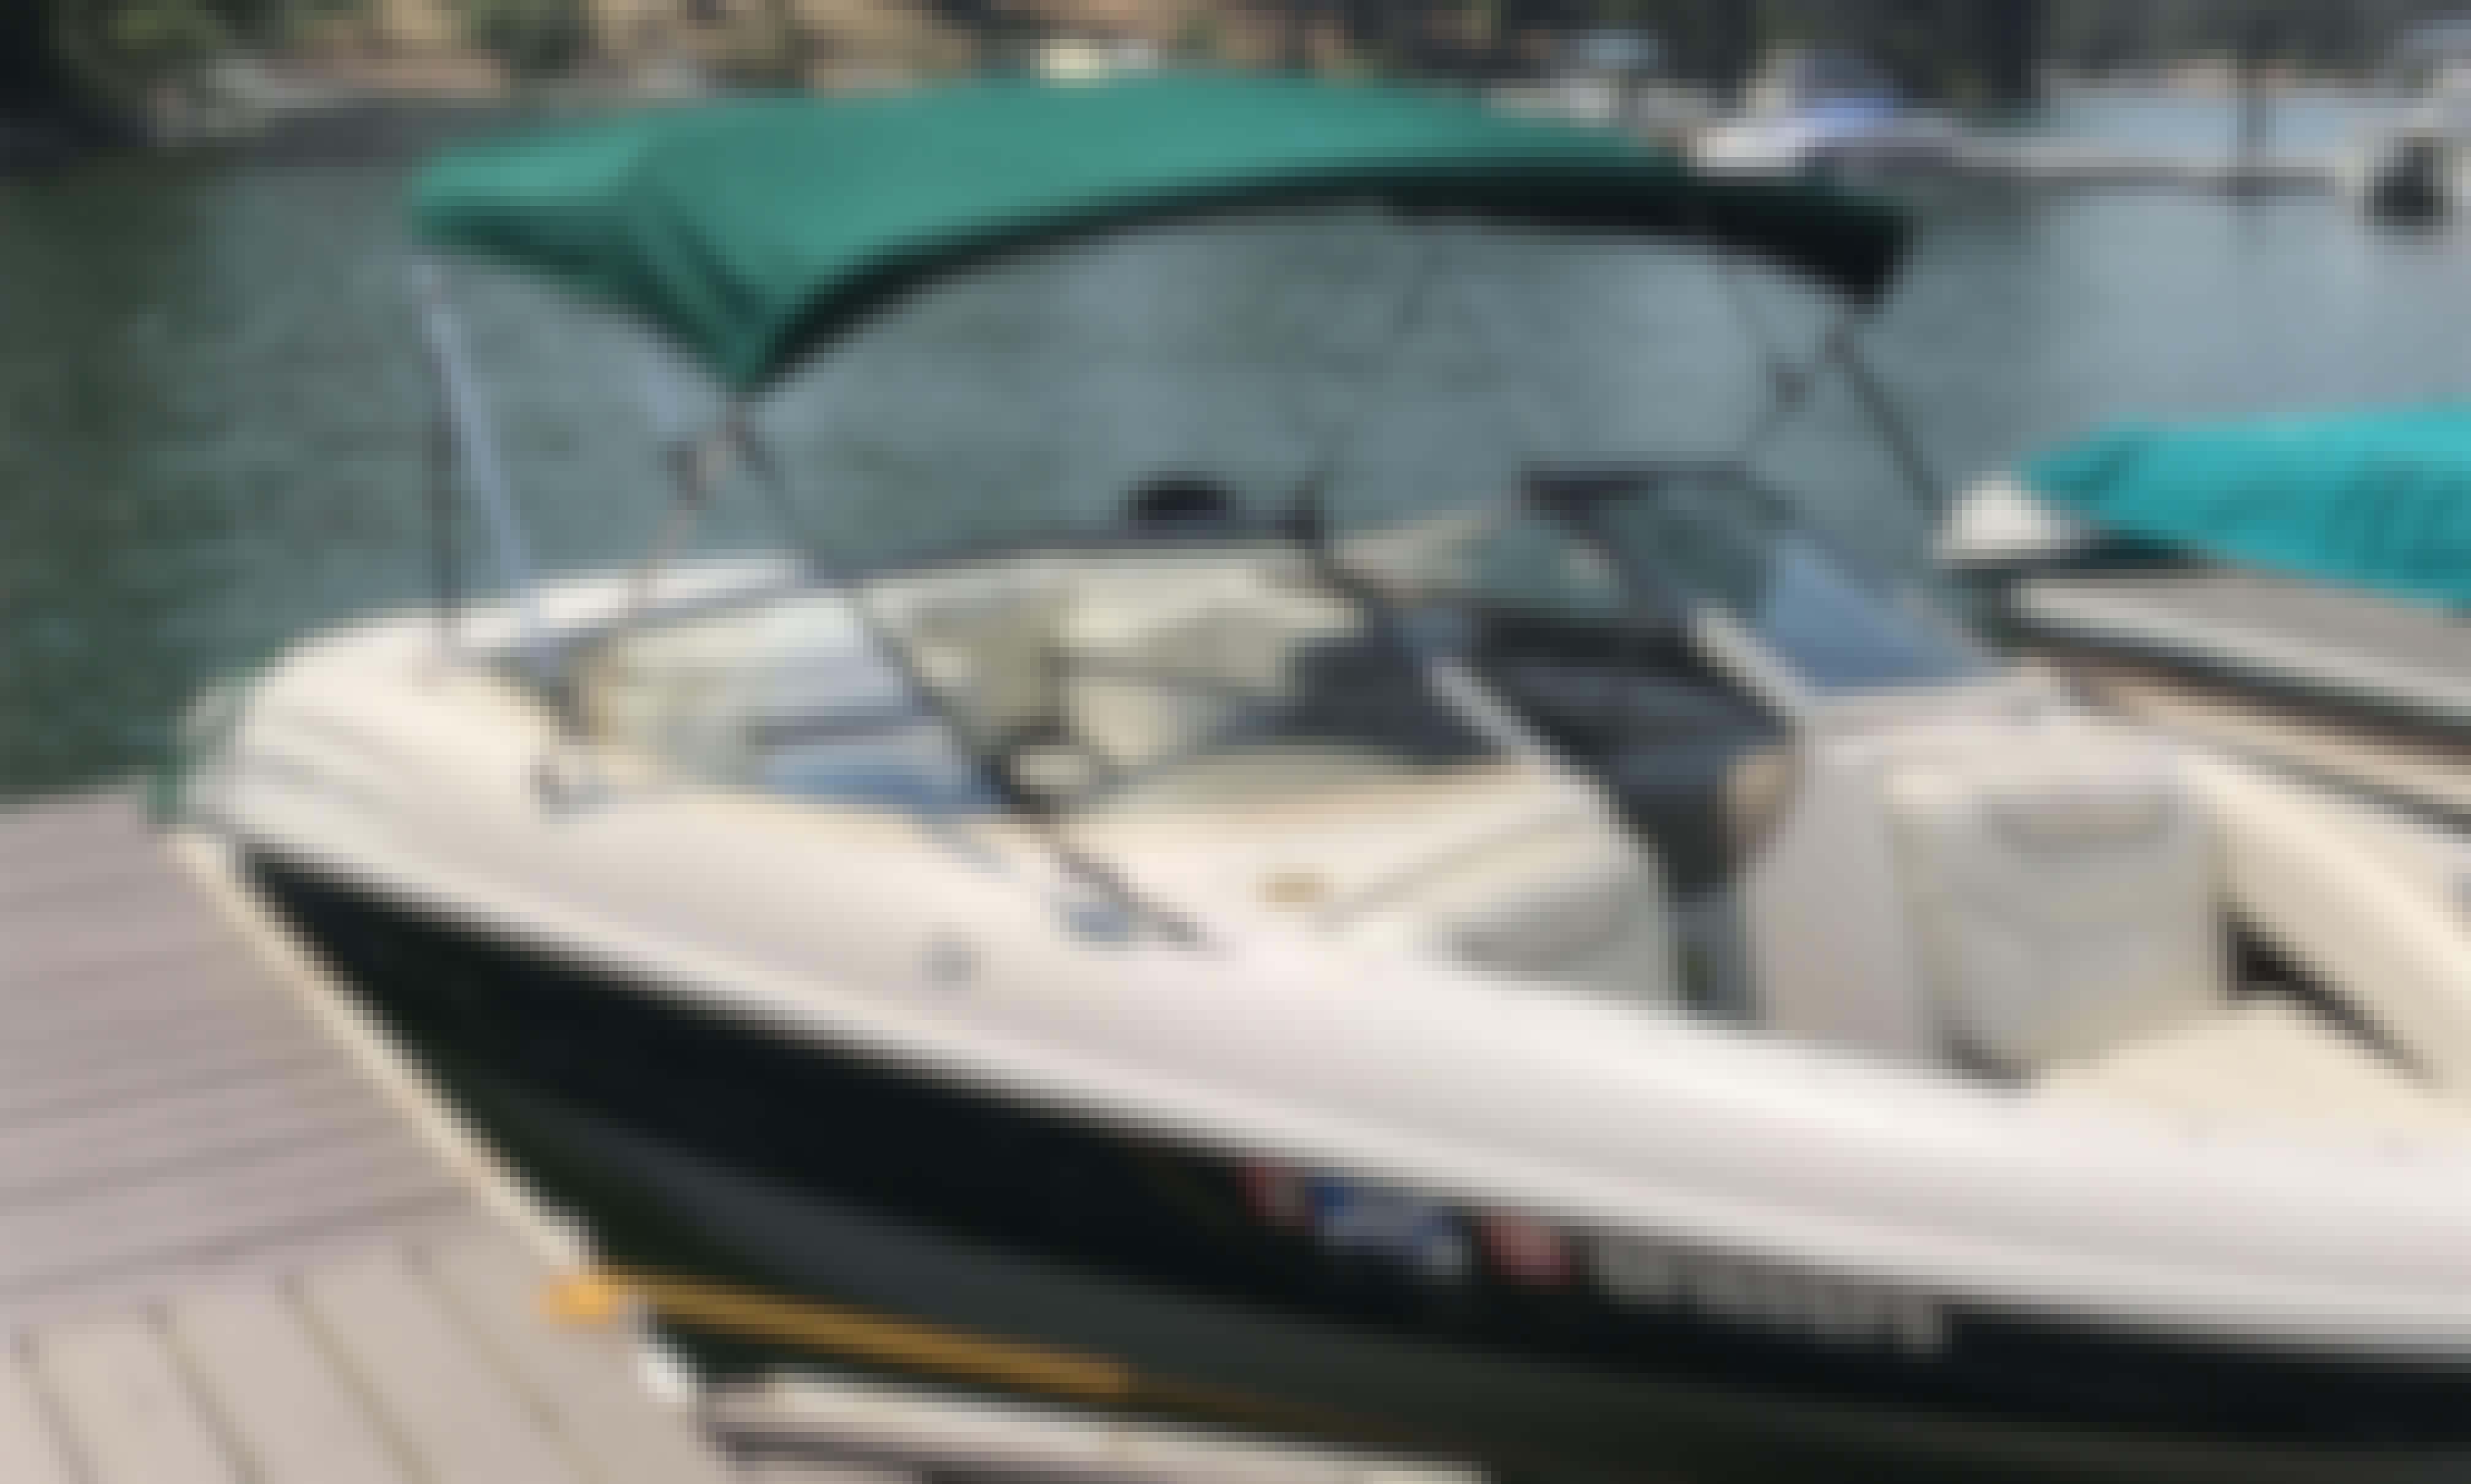 7 Passenger Boat Rental In Fresno, California